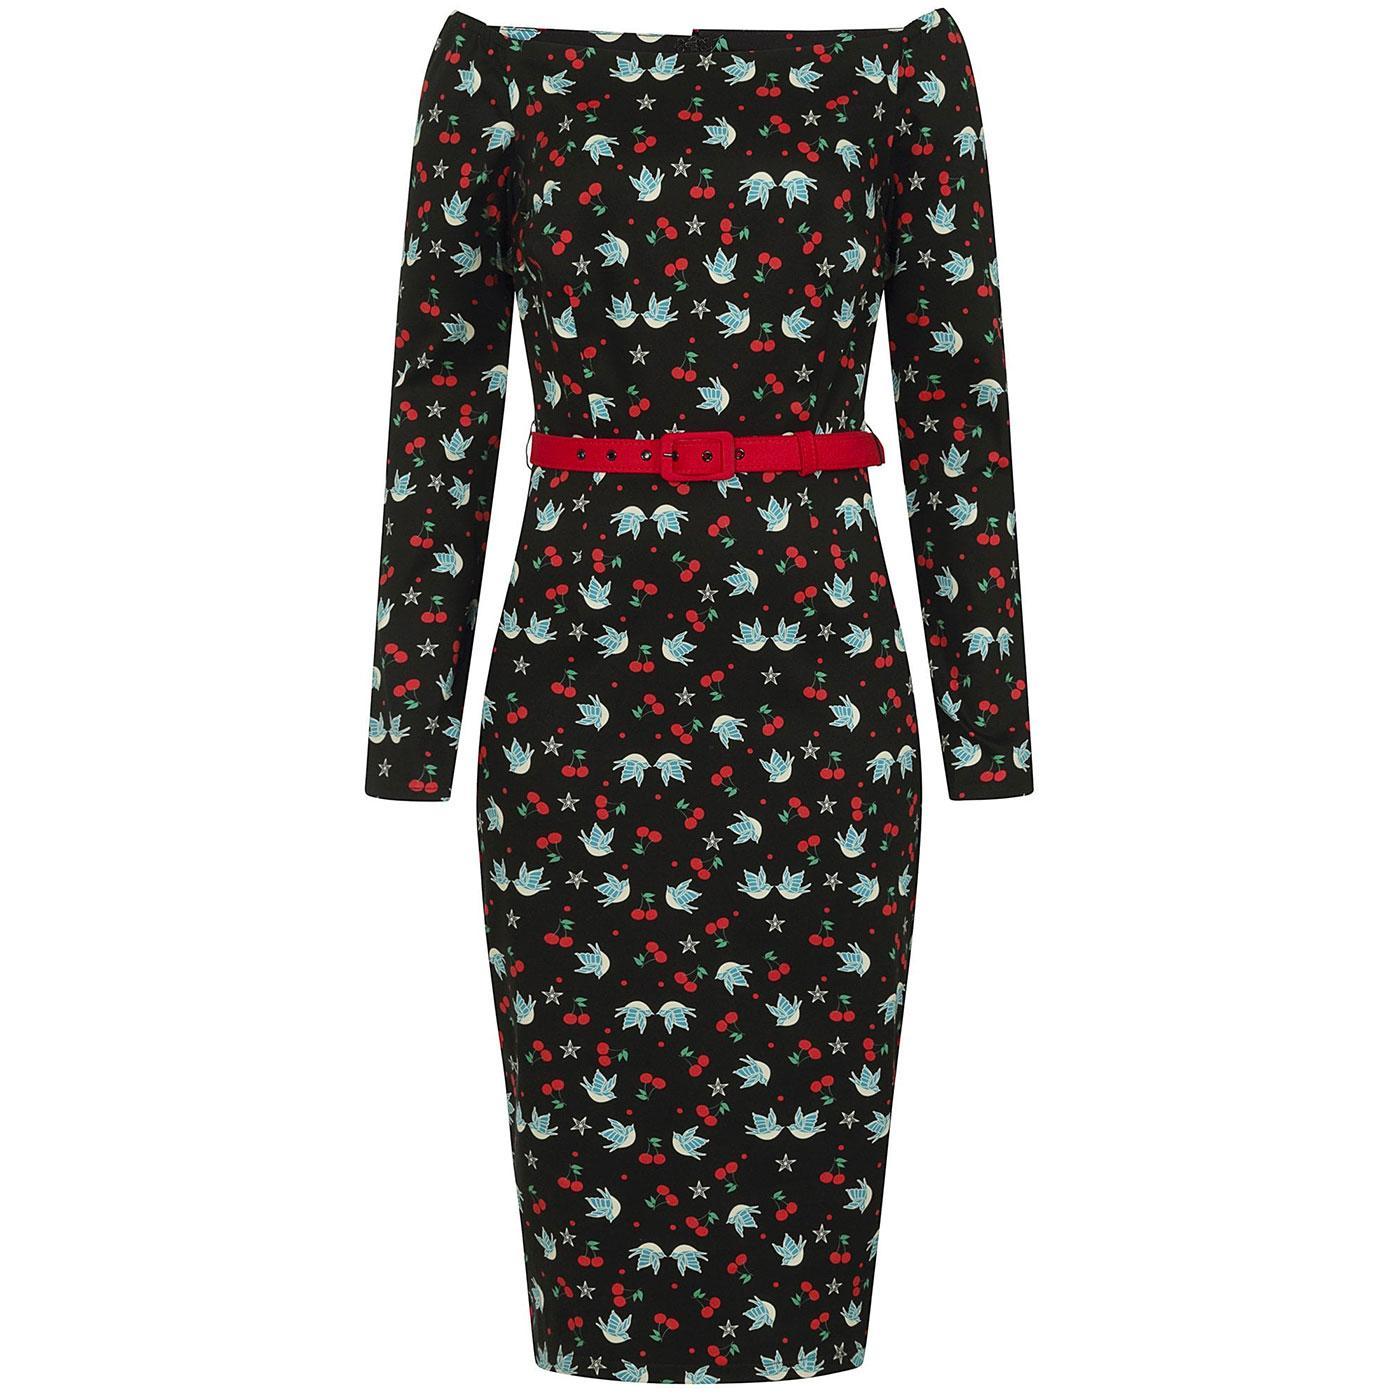 Meg COLLECTIF 50s Swallows & Cherries Pencil Dress